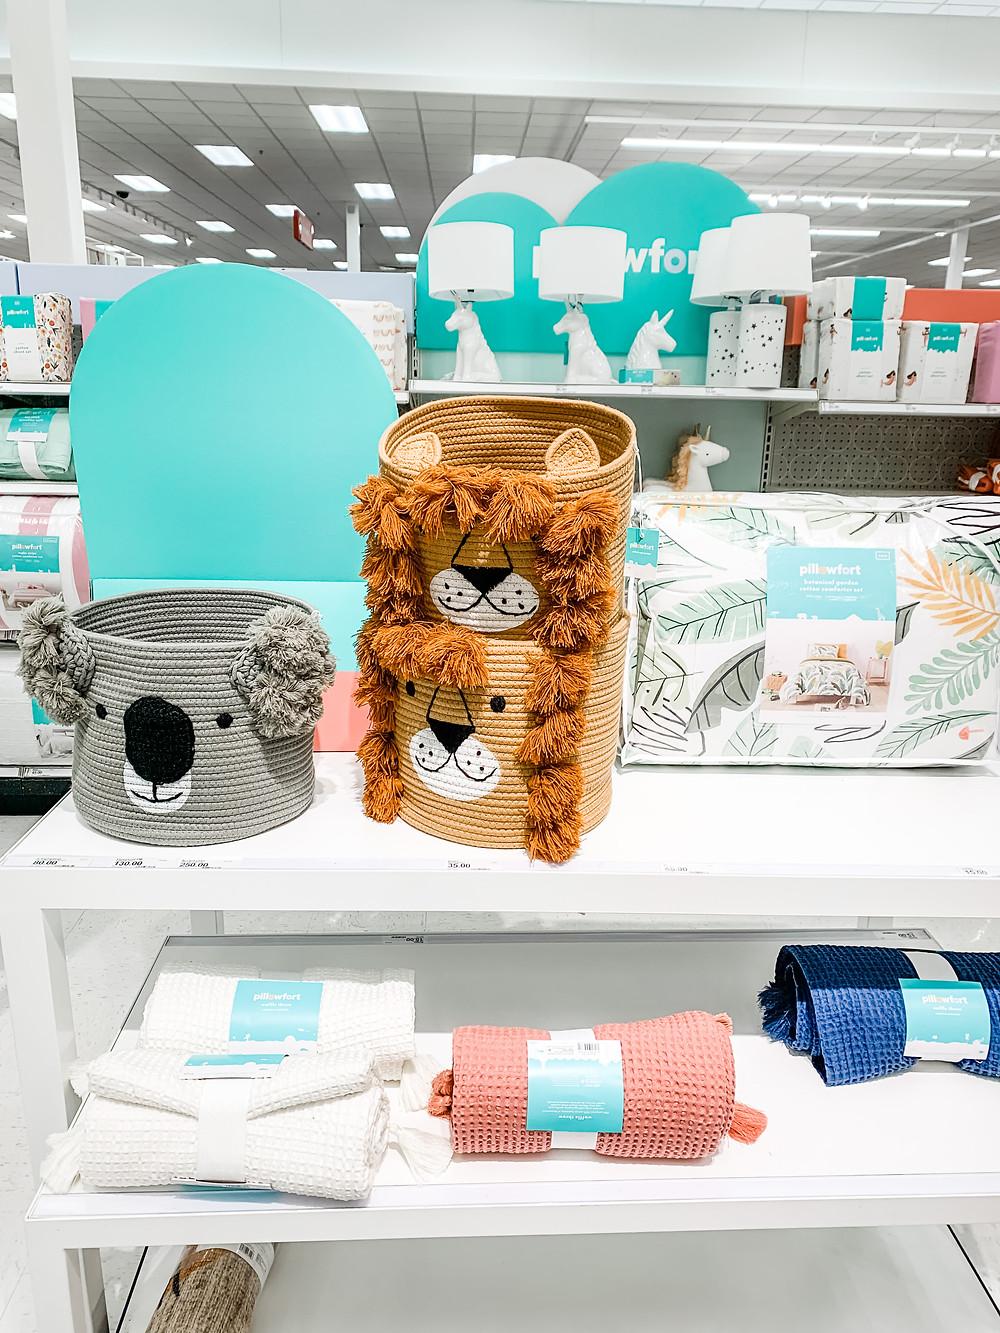 target pillowfort palm bedding set lion basket koala basket new line spring 2021